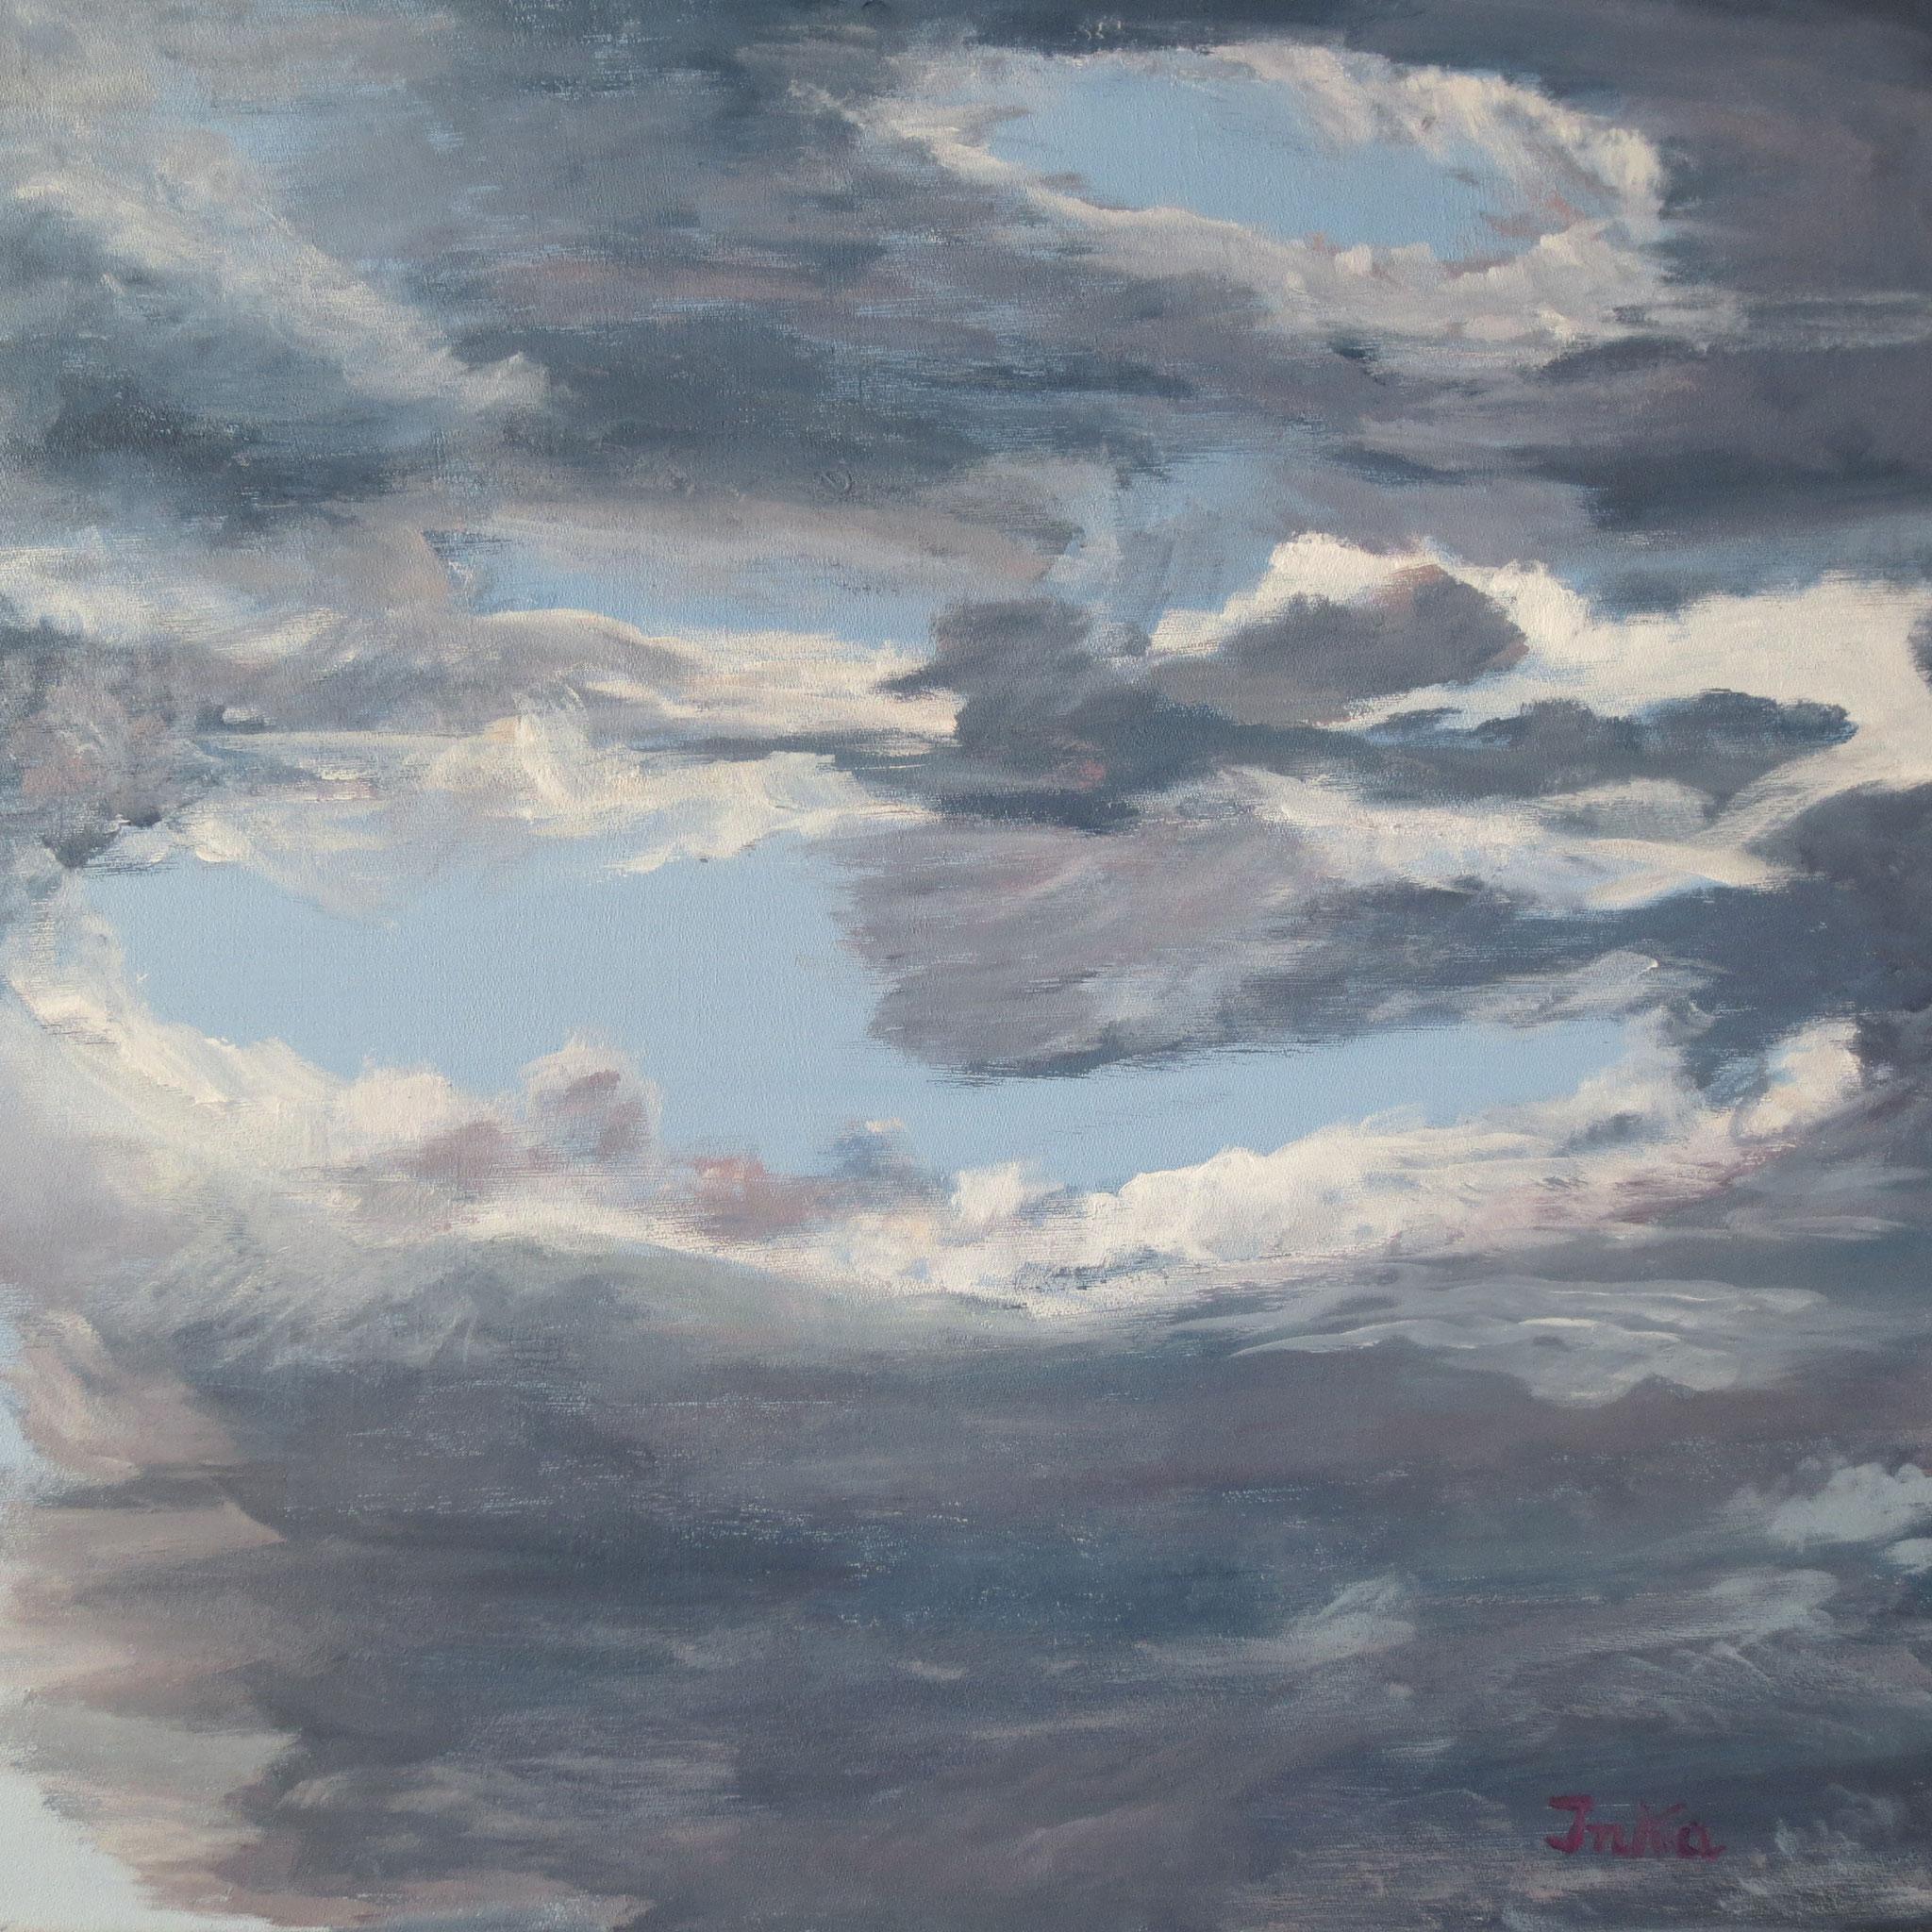 nach dem Regen (50 x 50)